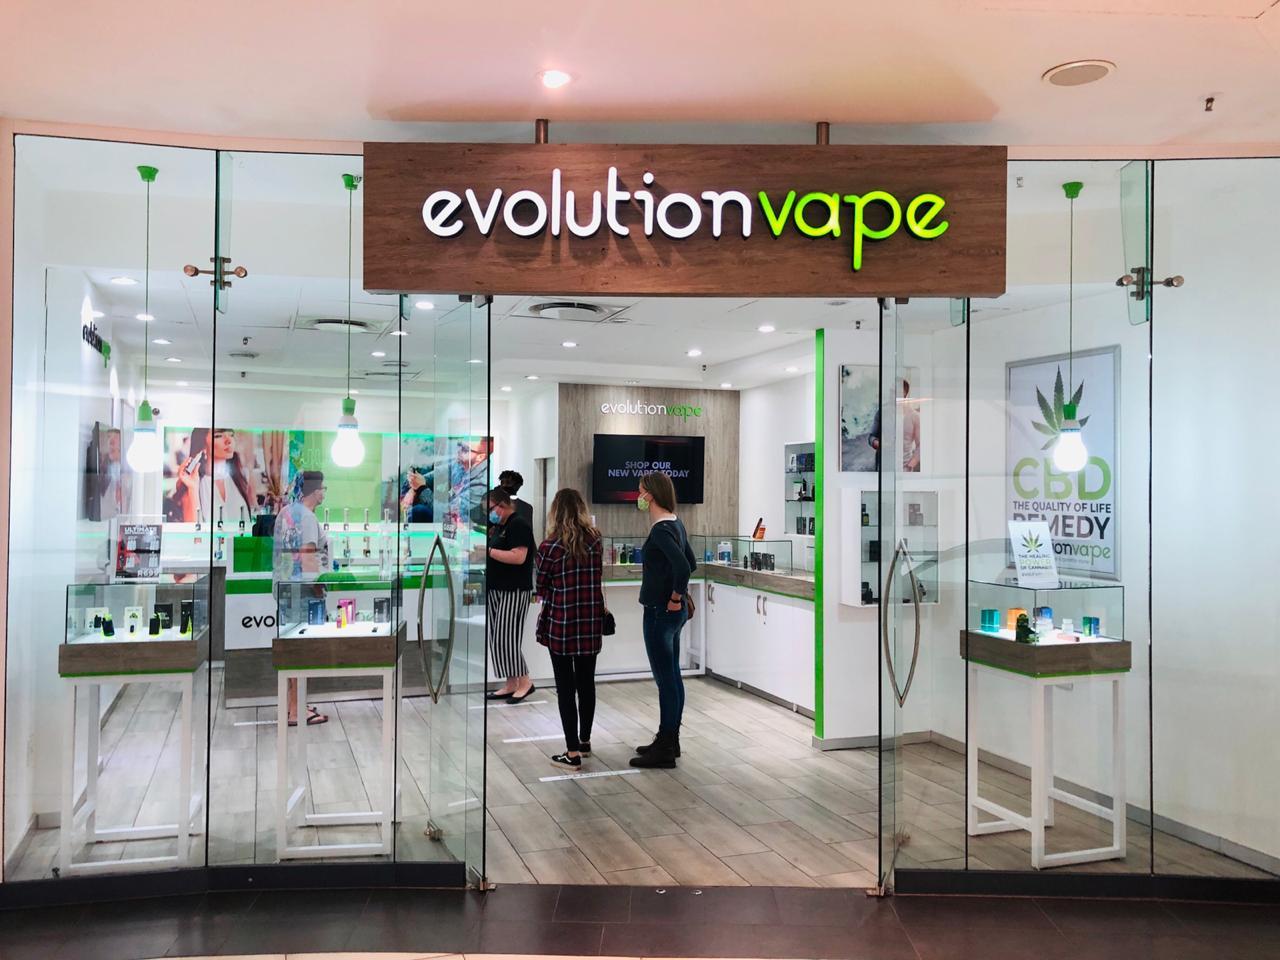 Evolution Vape (E-Vape)